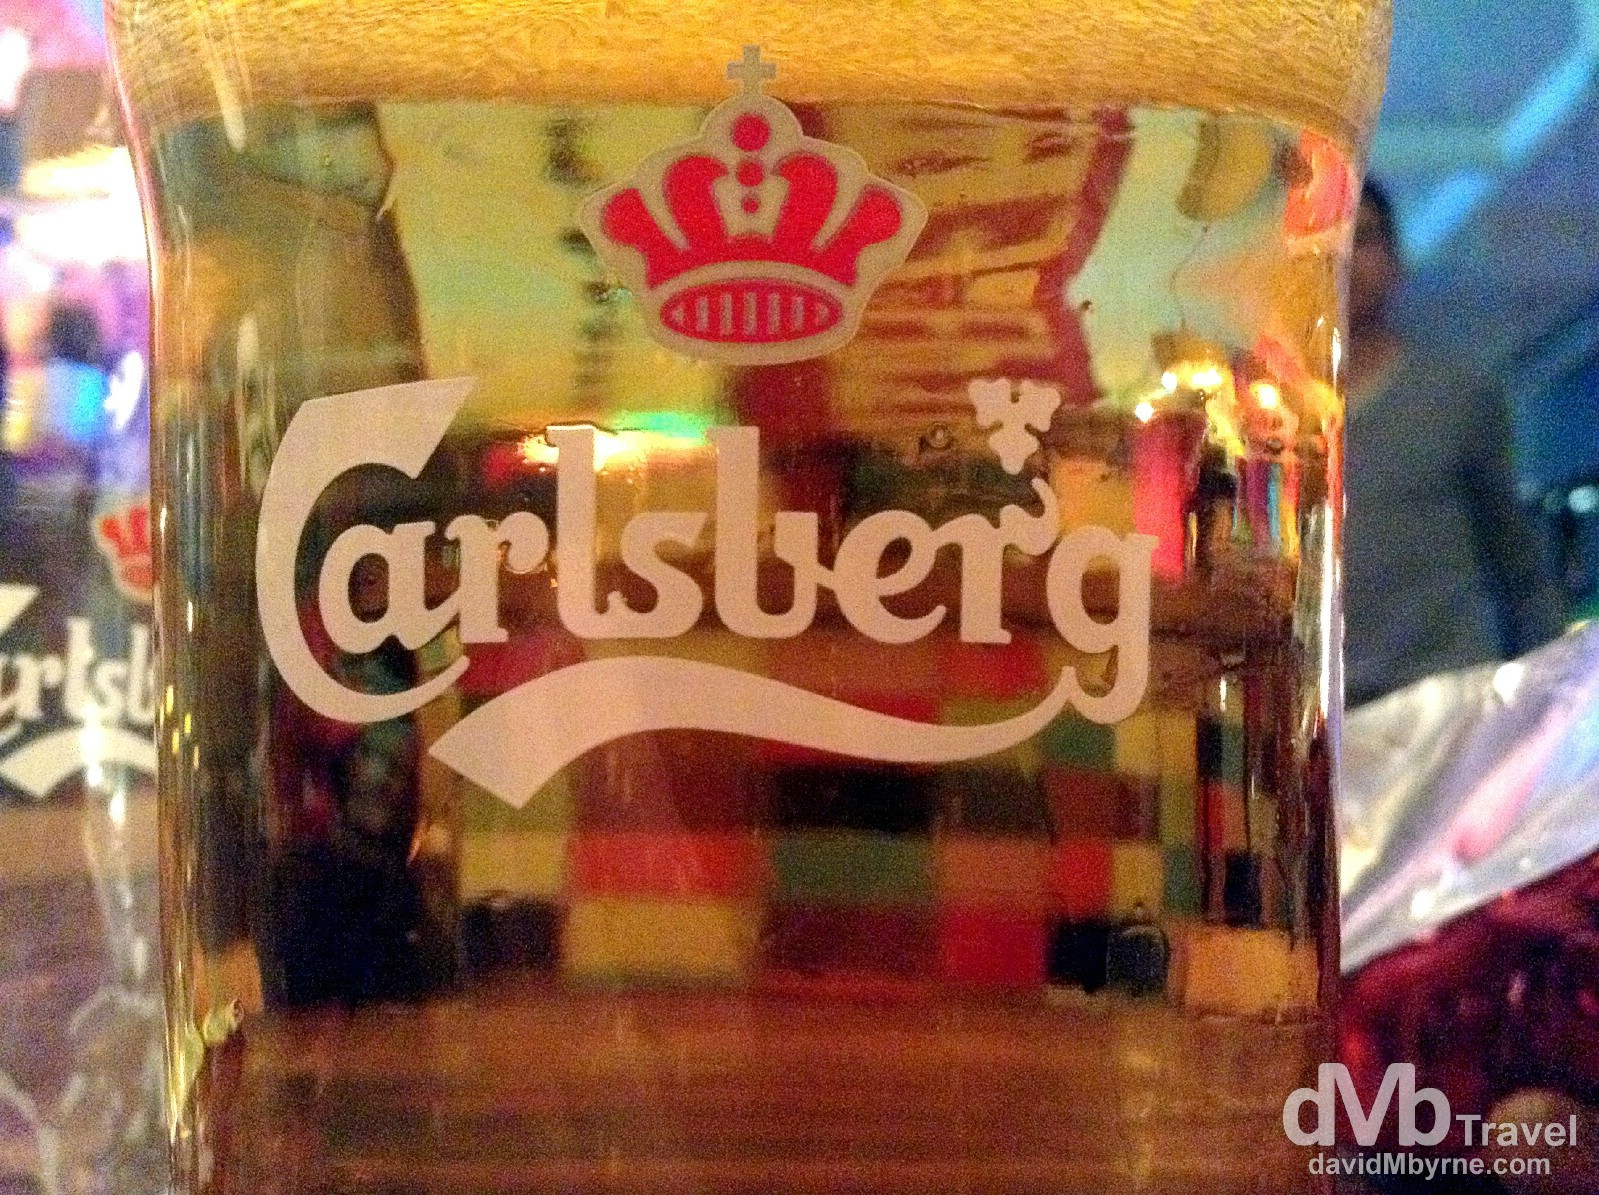 Carlsberg in Copenhagen Downtown Hostel, Copenhagen, Denmark. March 12th, 2014 (iPod Touch v5)